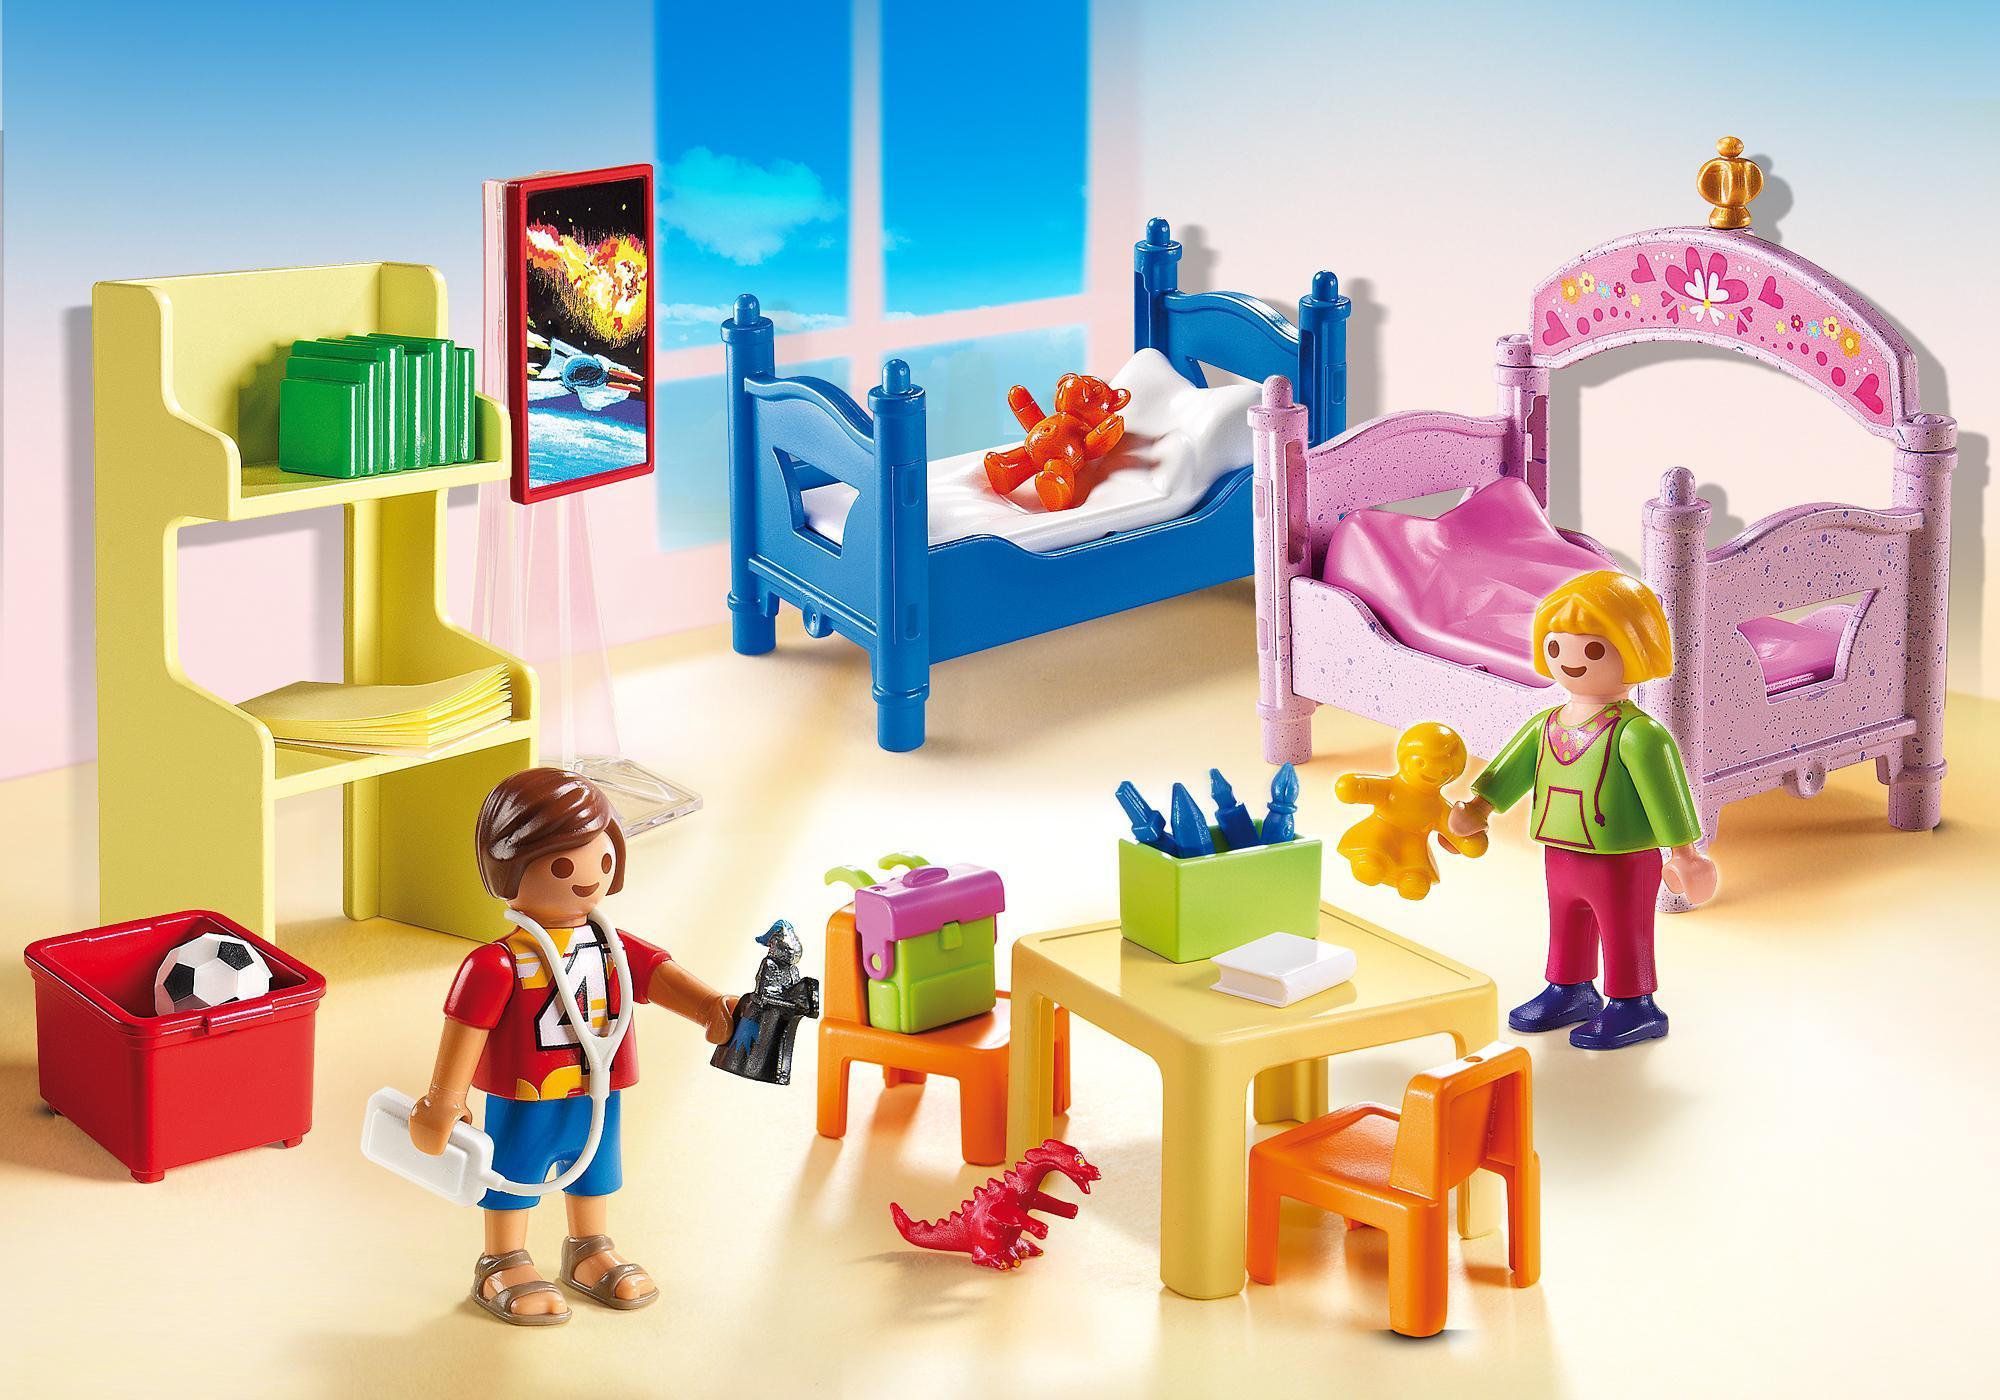 Buntes Kinderzimmer - 5306 - PLAYMOBIL® Deutschland | {Kinderzimmer de 58}